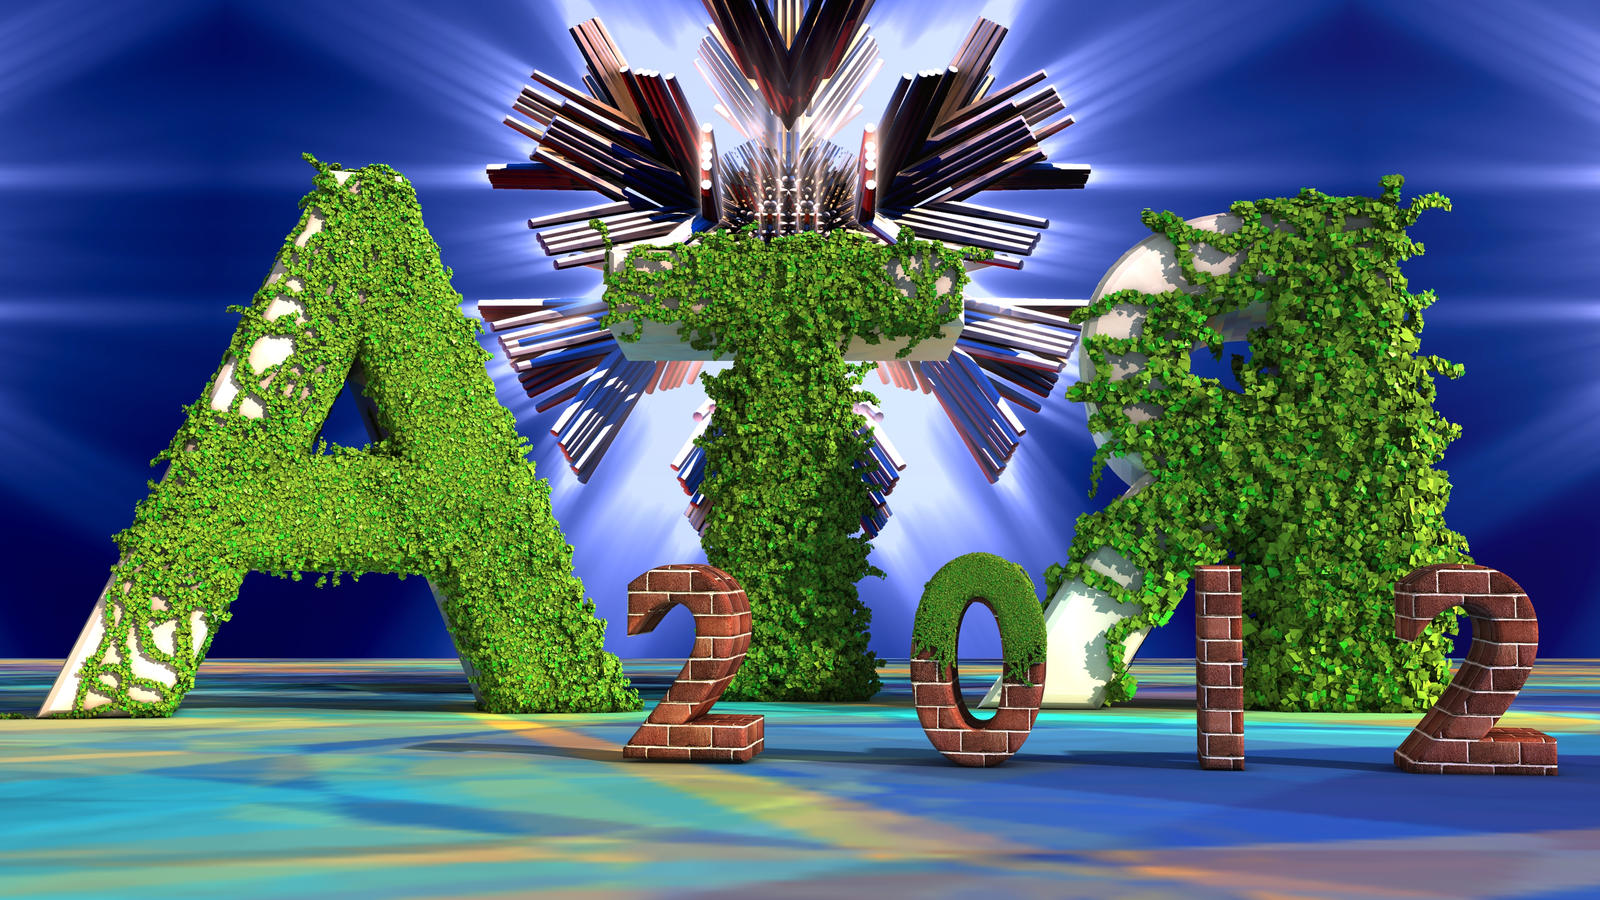 ART 2012 by nic022